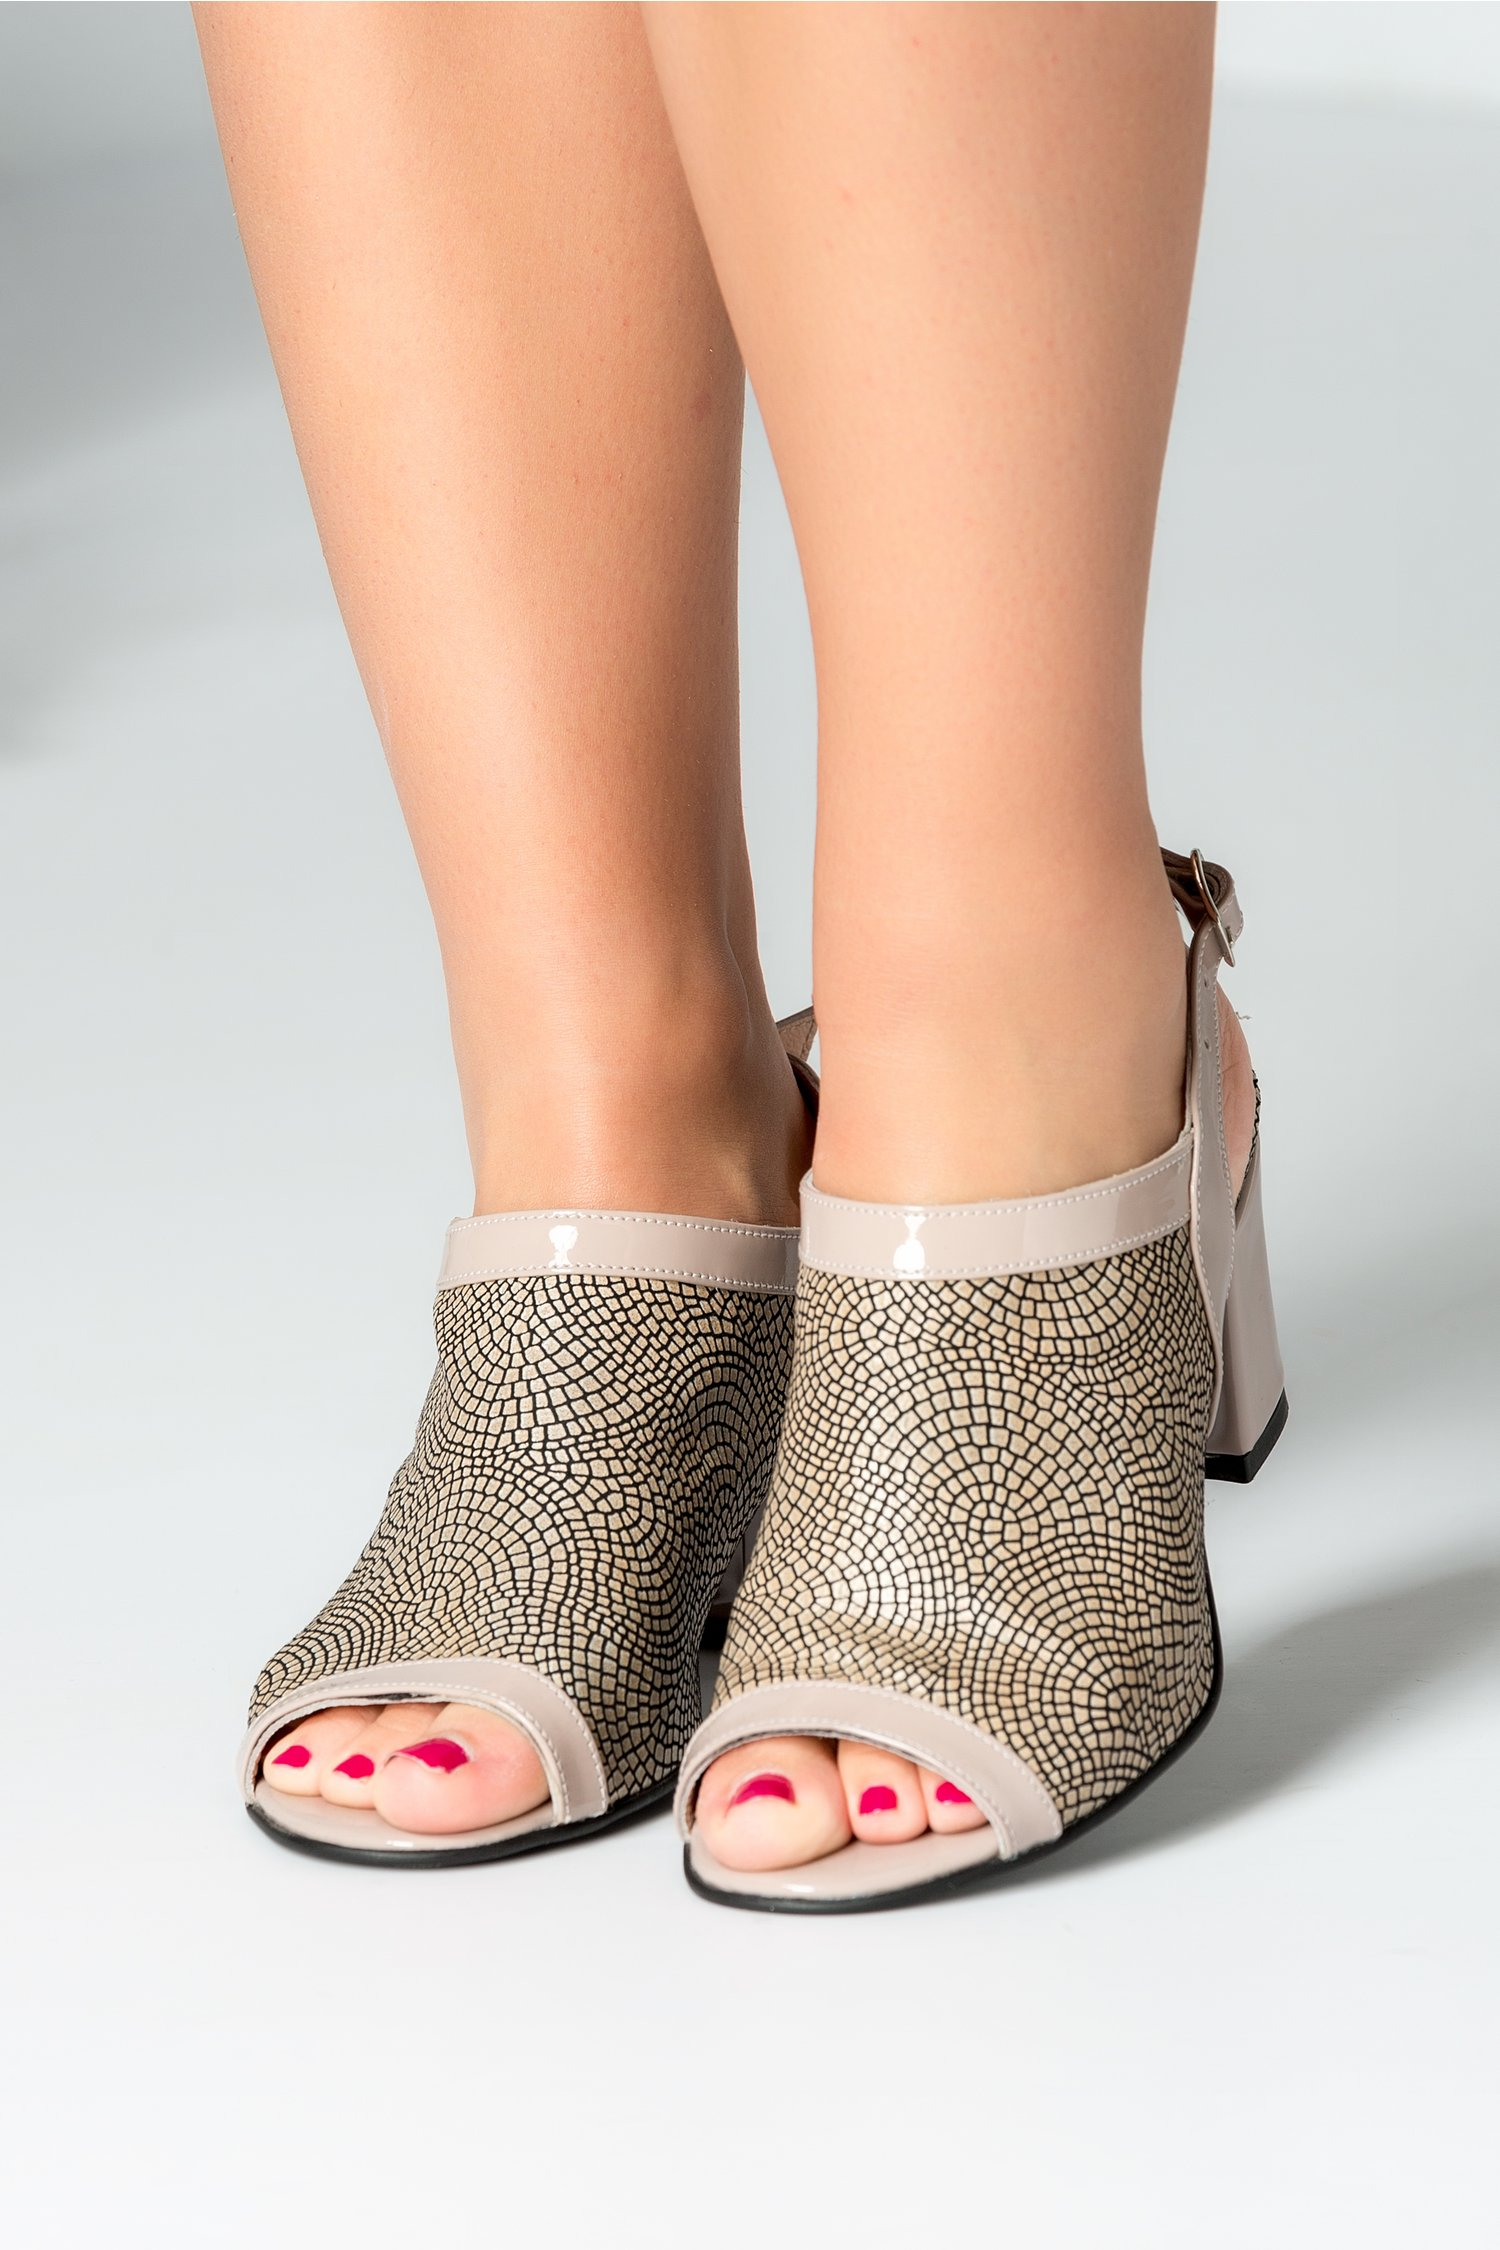 Sandale dama rose prafuit cu imprimeuri